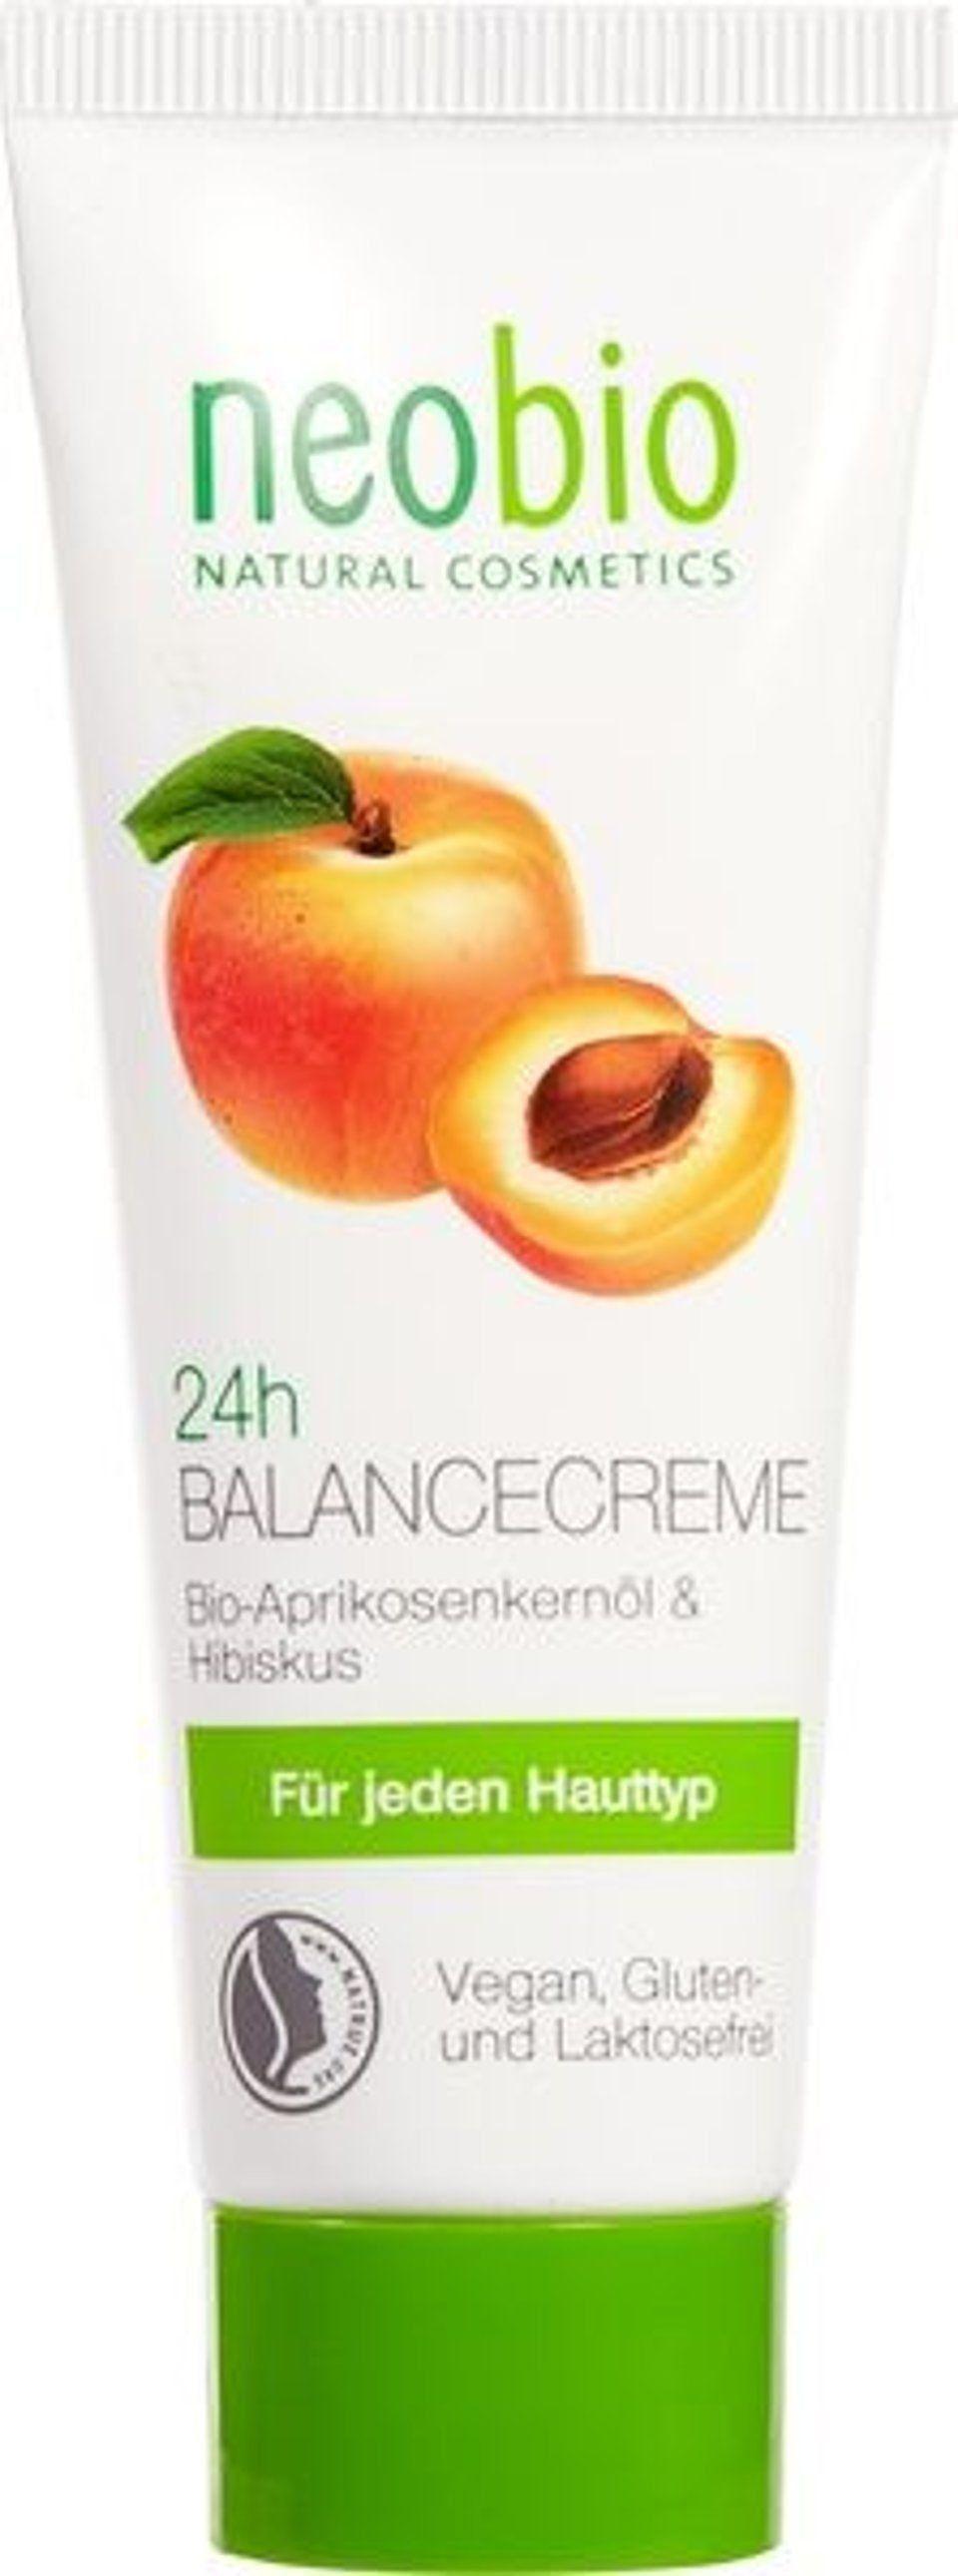 24-h balancecreme